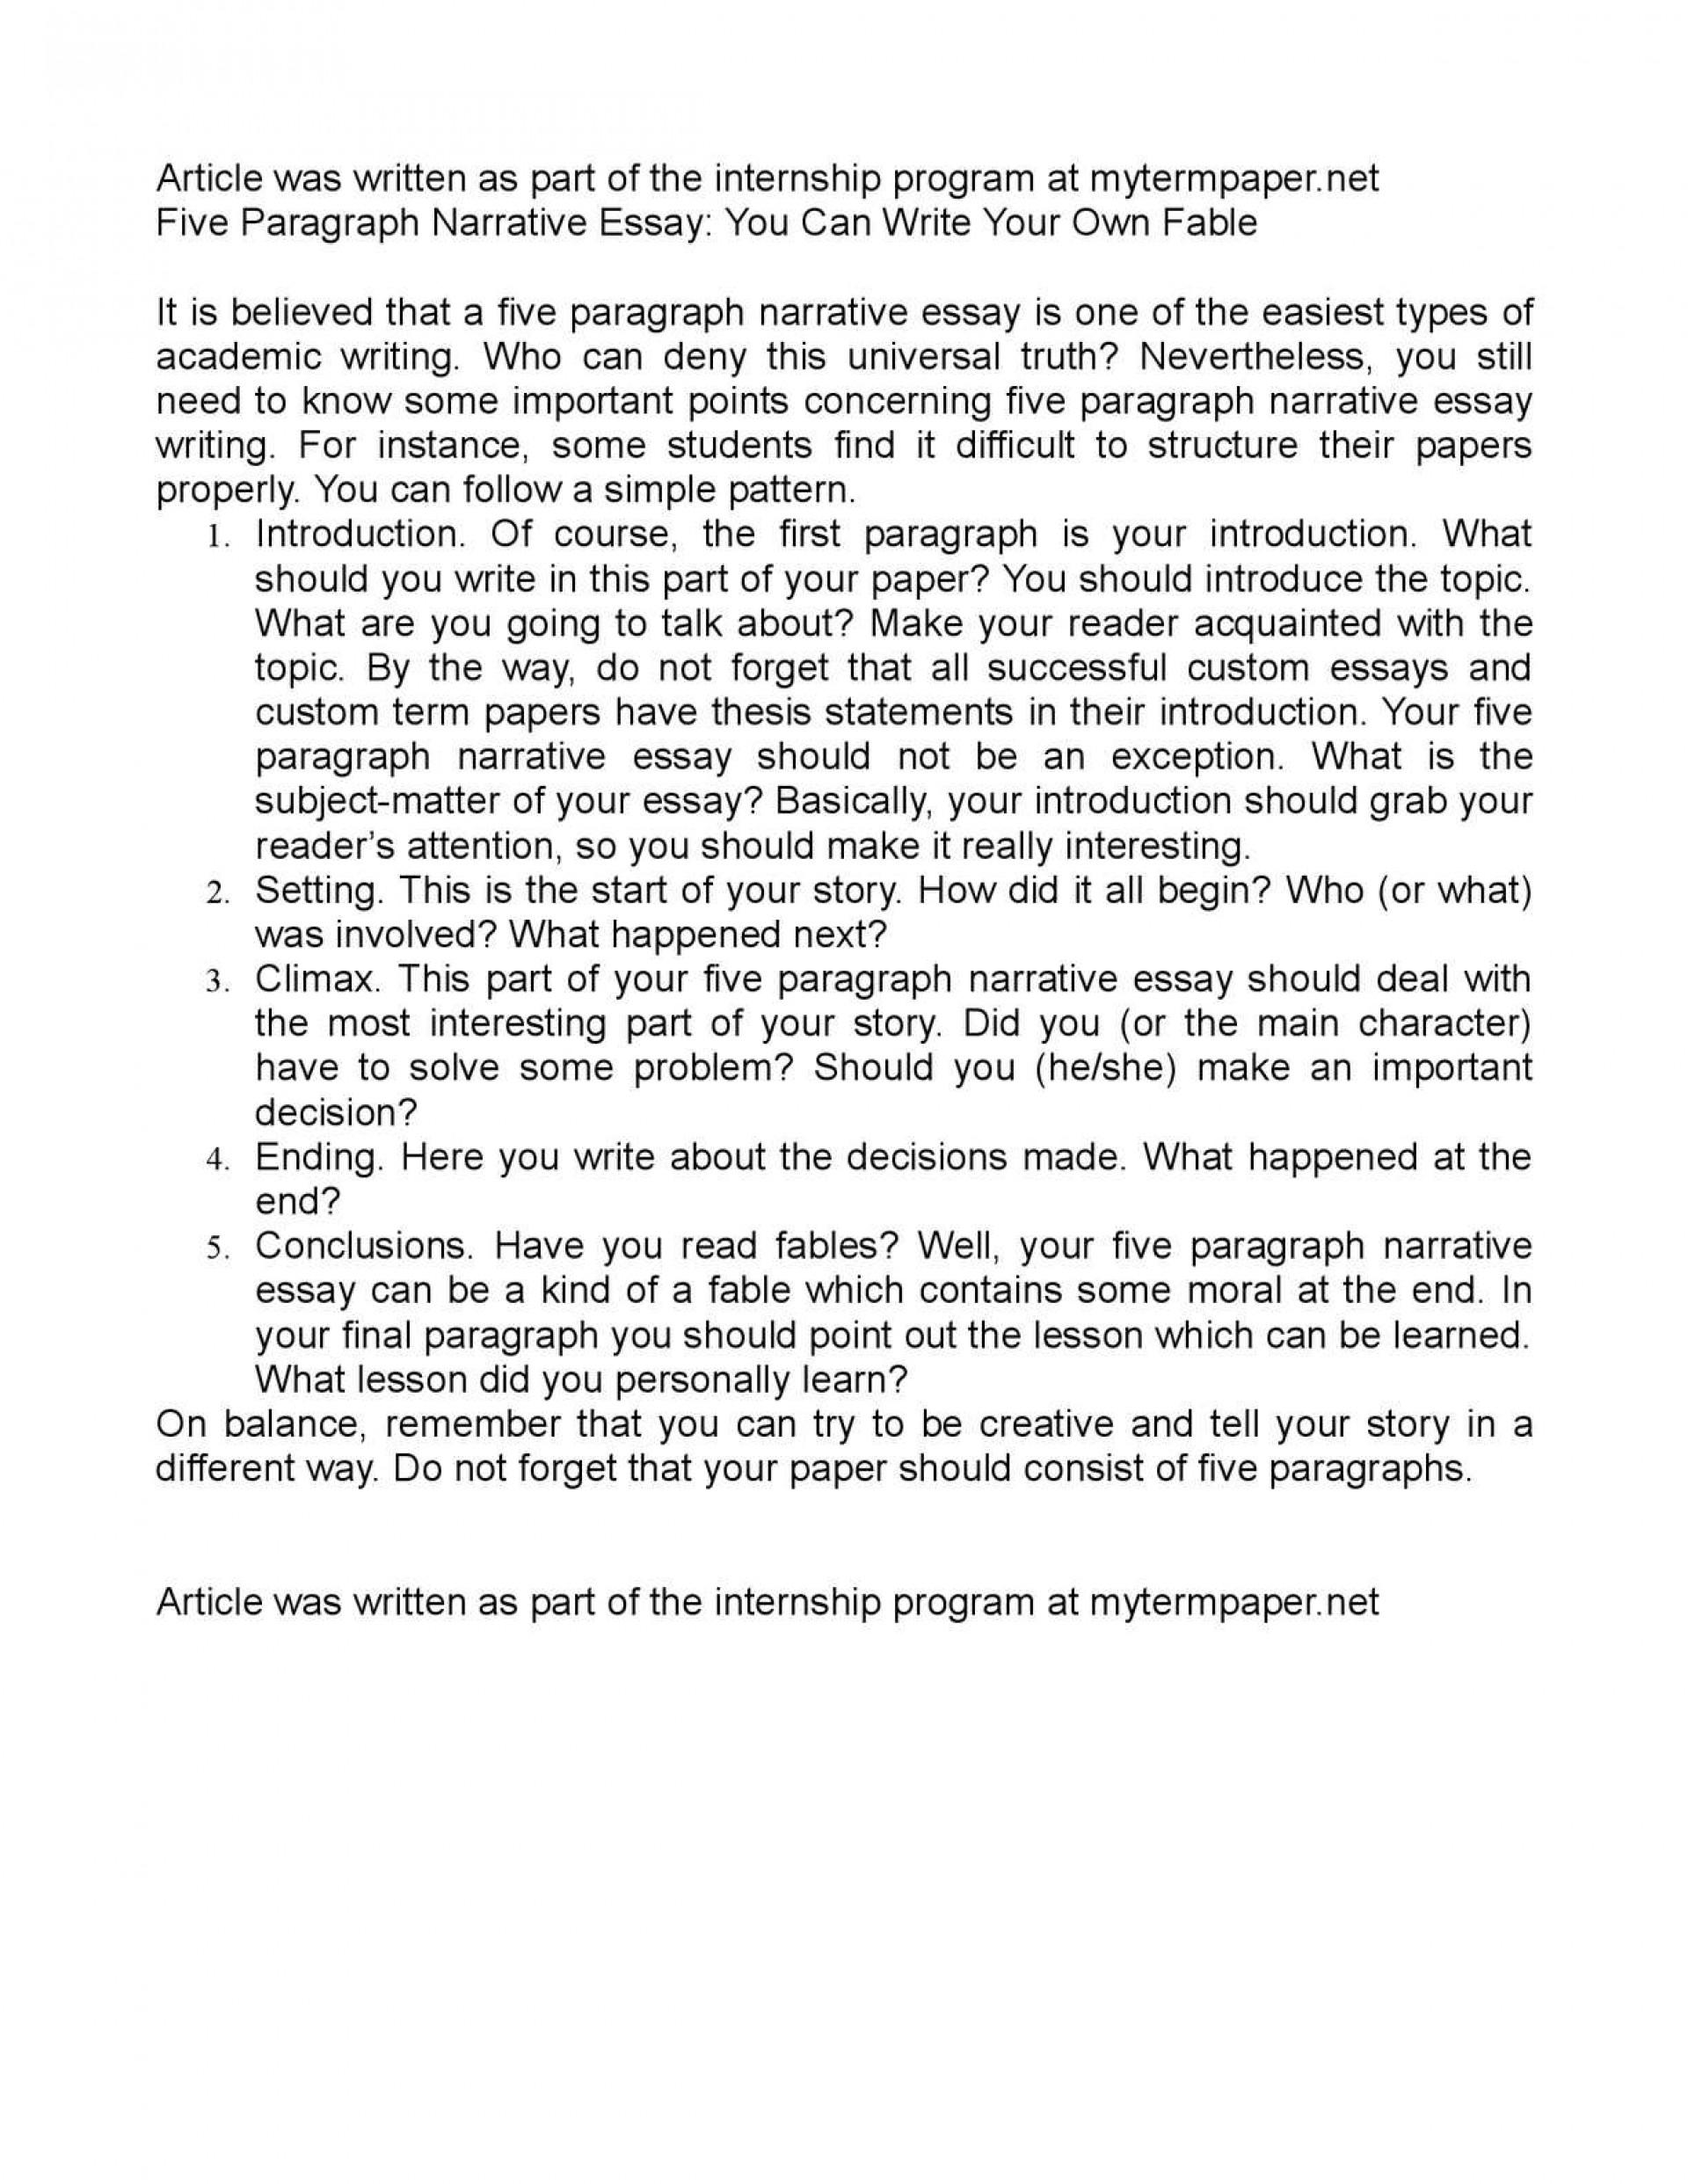 002 Paragraph Essay Example College Do Essays Have To Paragraphs Calam Eacute O Five Paragra Excellent 5 Pdf 1920